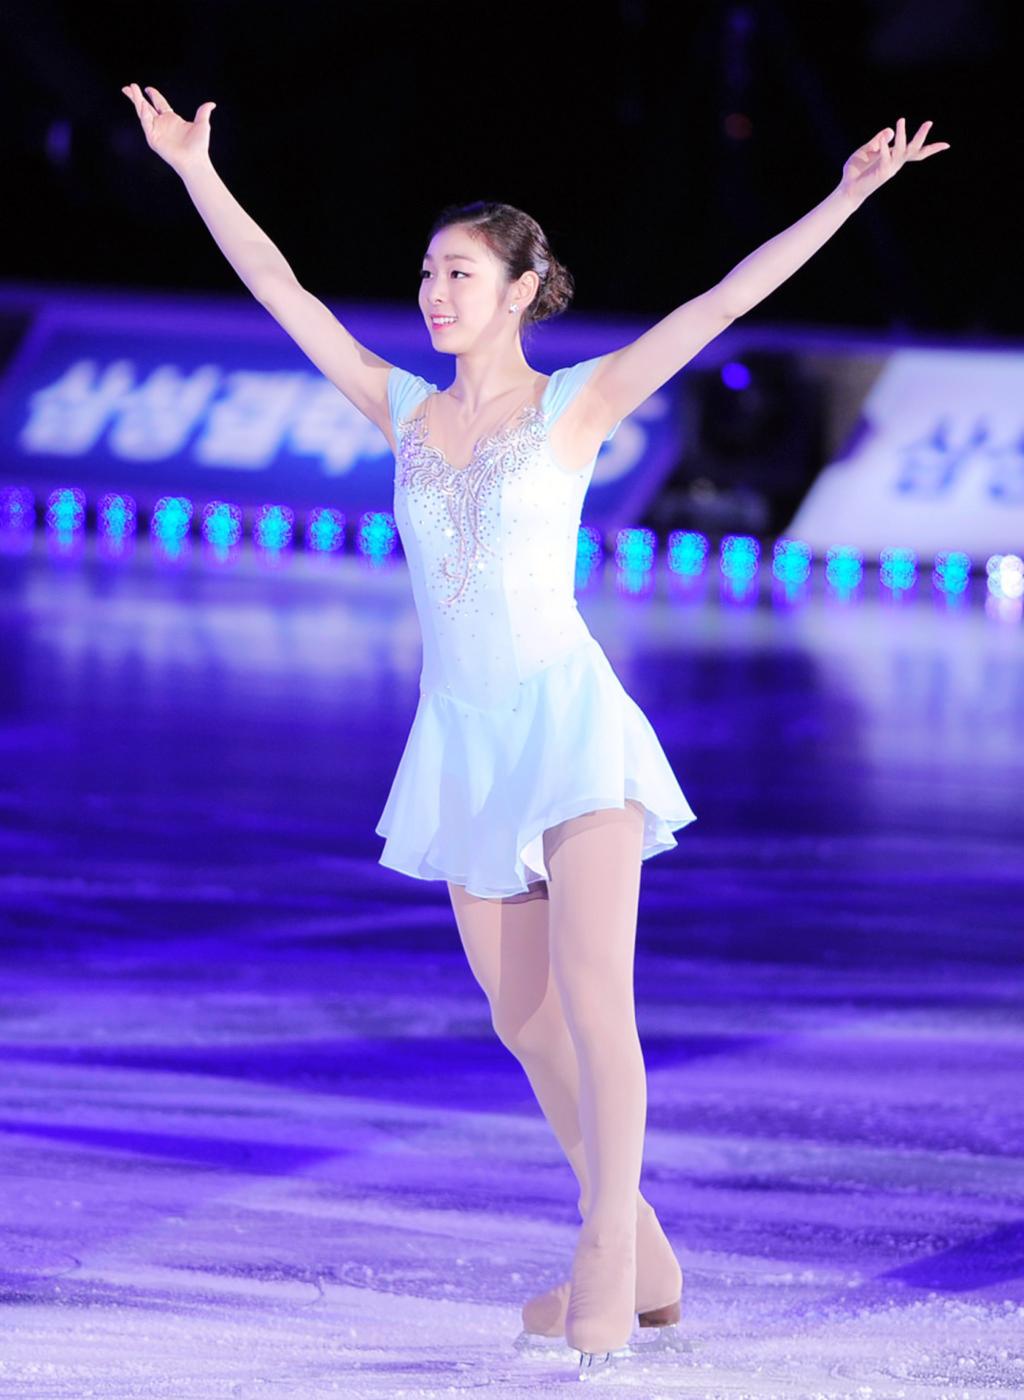 All That Skate 2014 Figure Skating Queen Yuna Kim